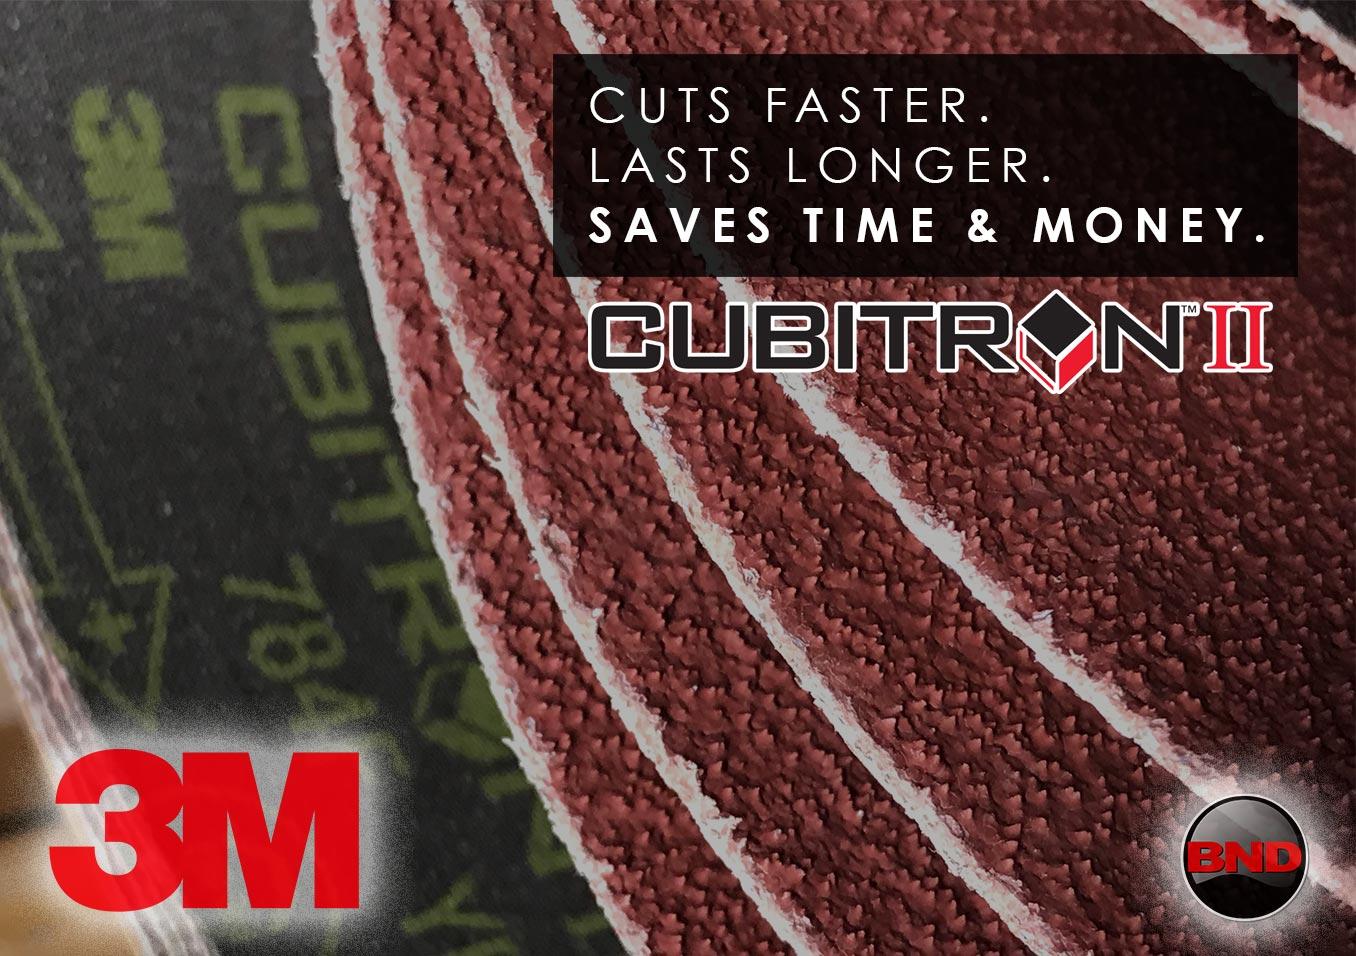 3M Cubitron II Belts and Discs